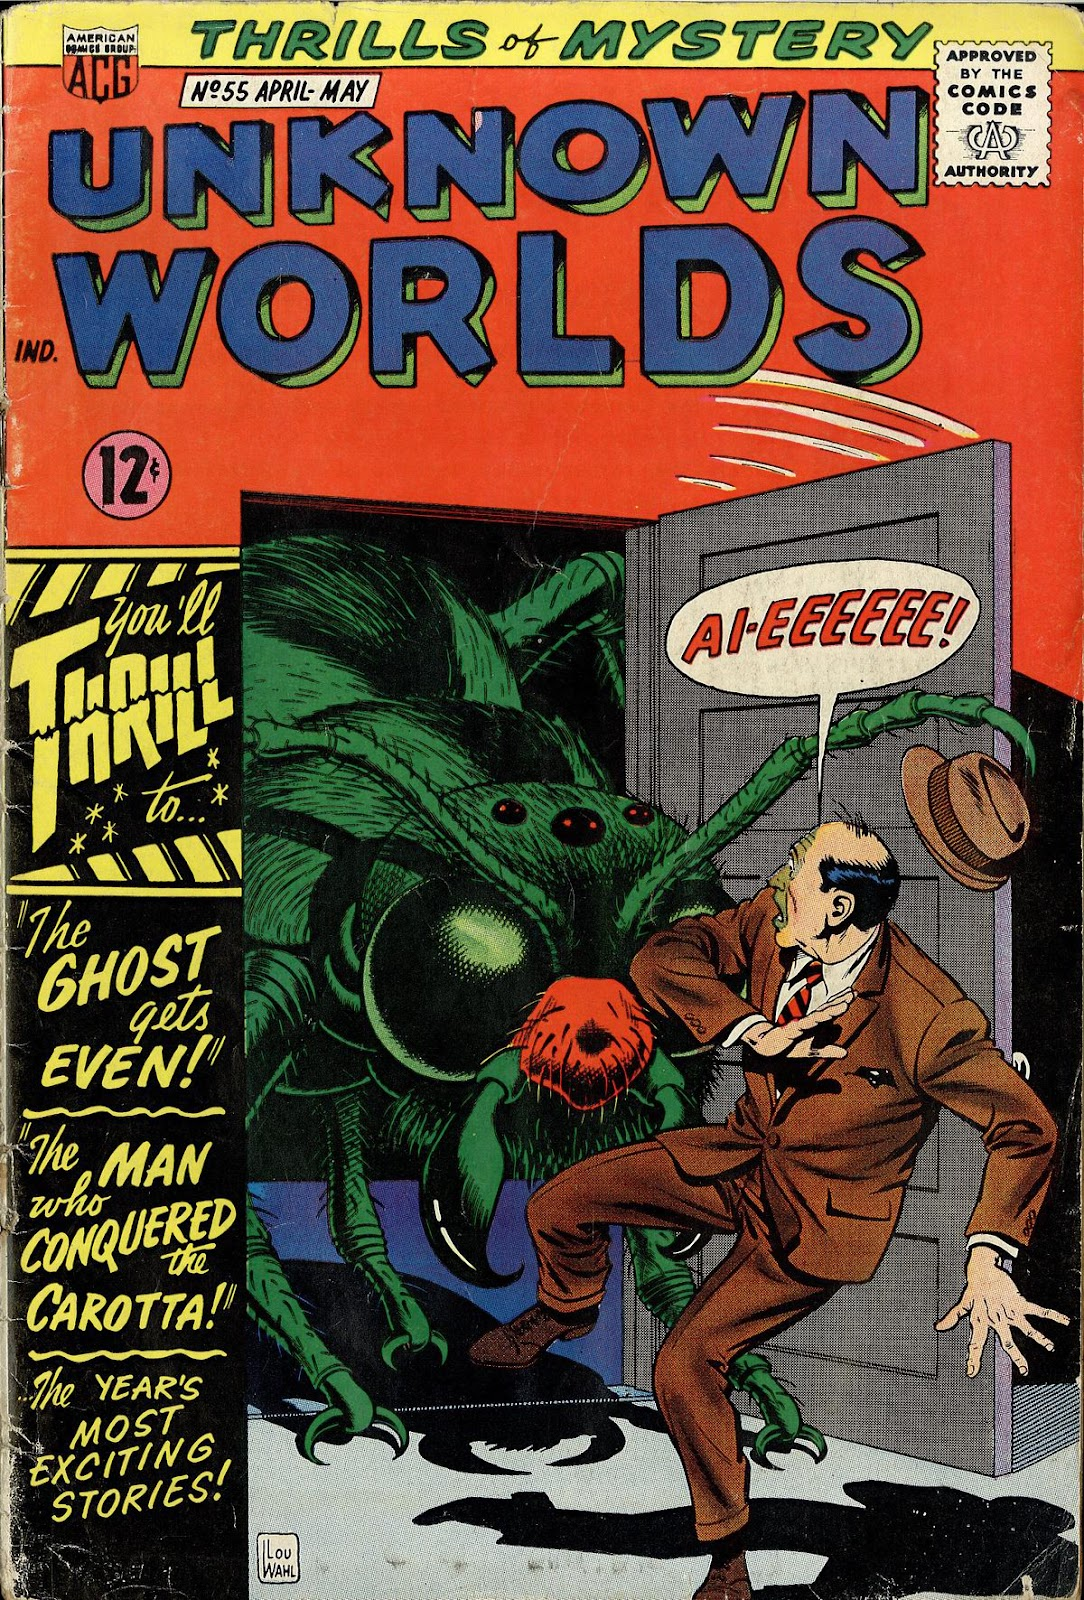 Unknown Worlds 55 Page 1